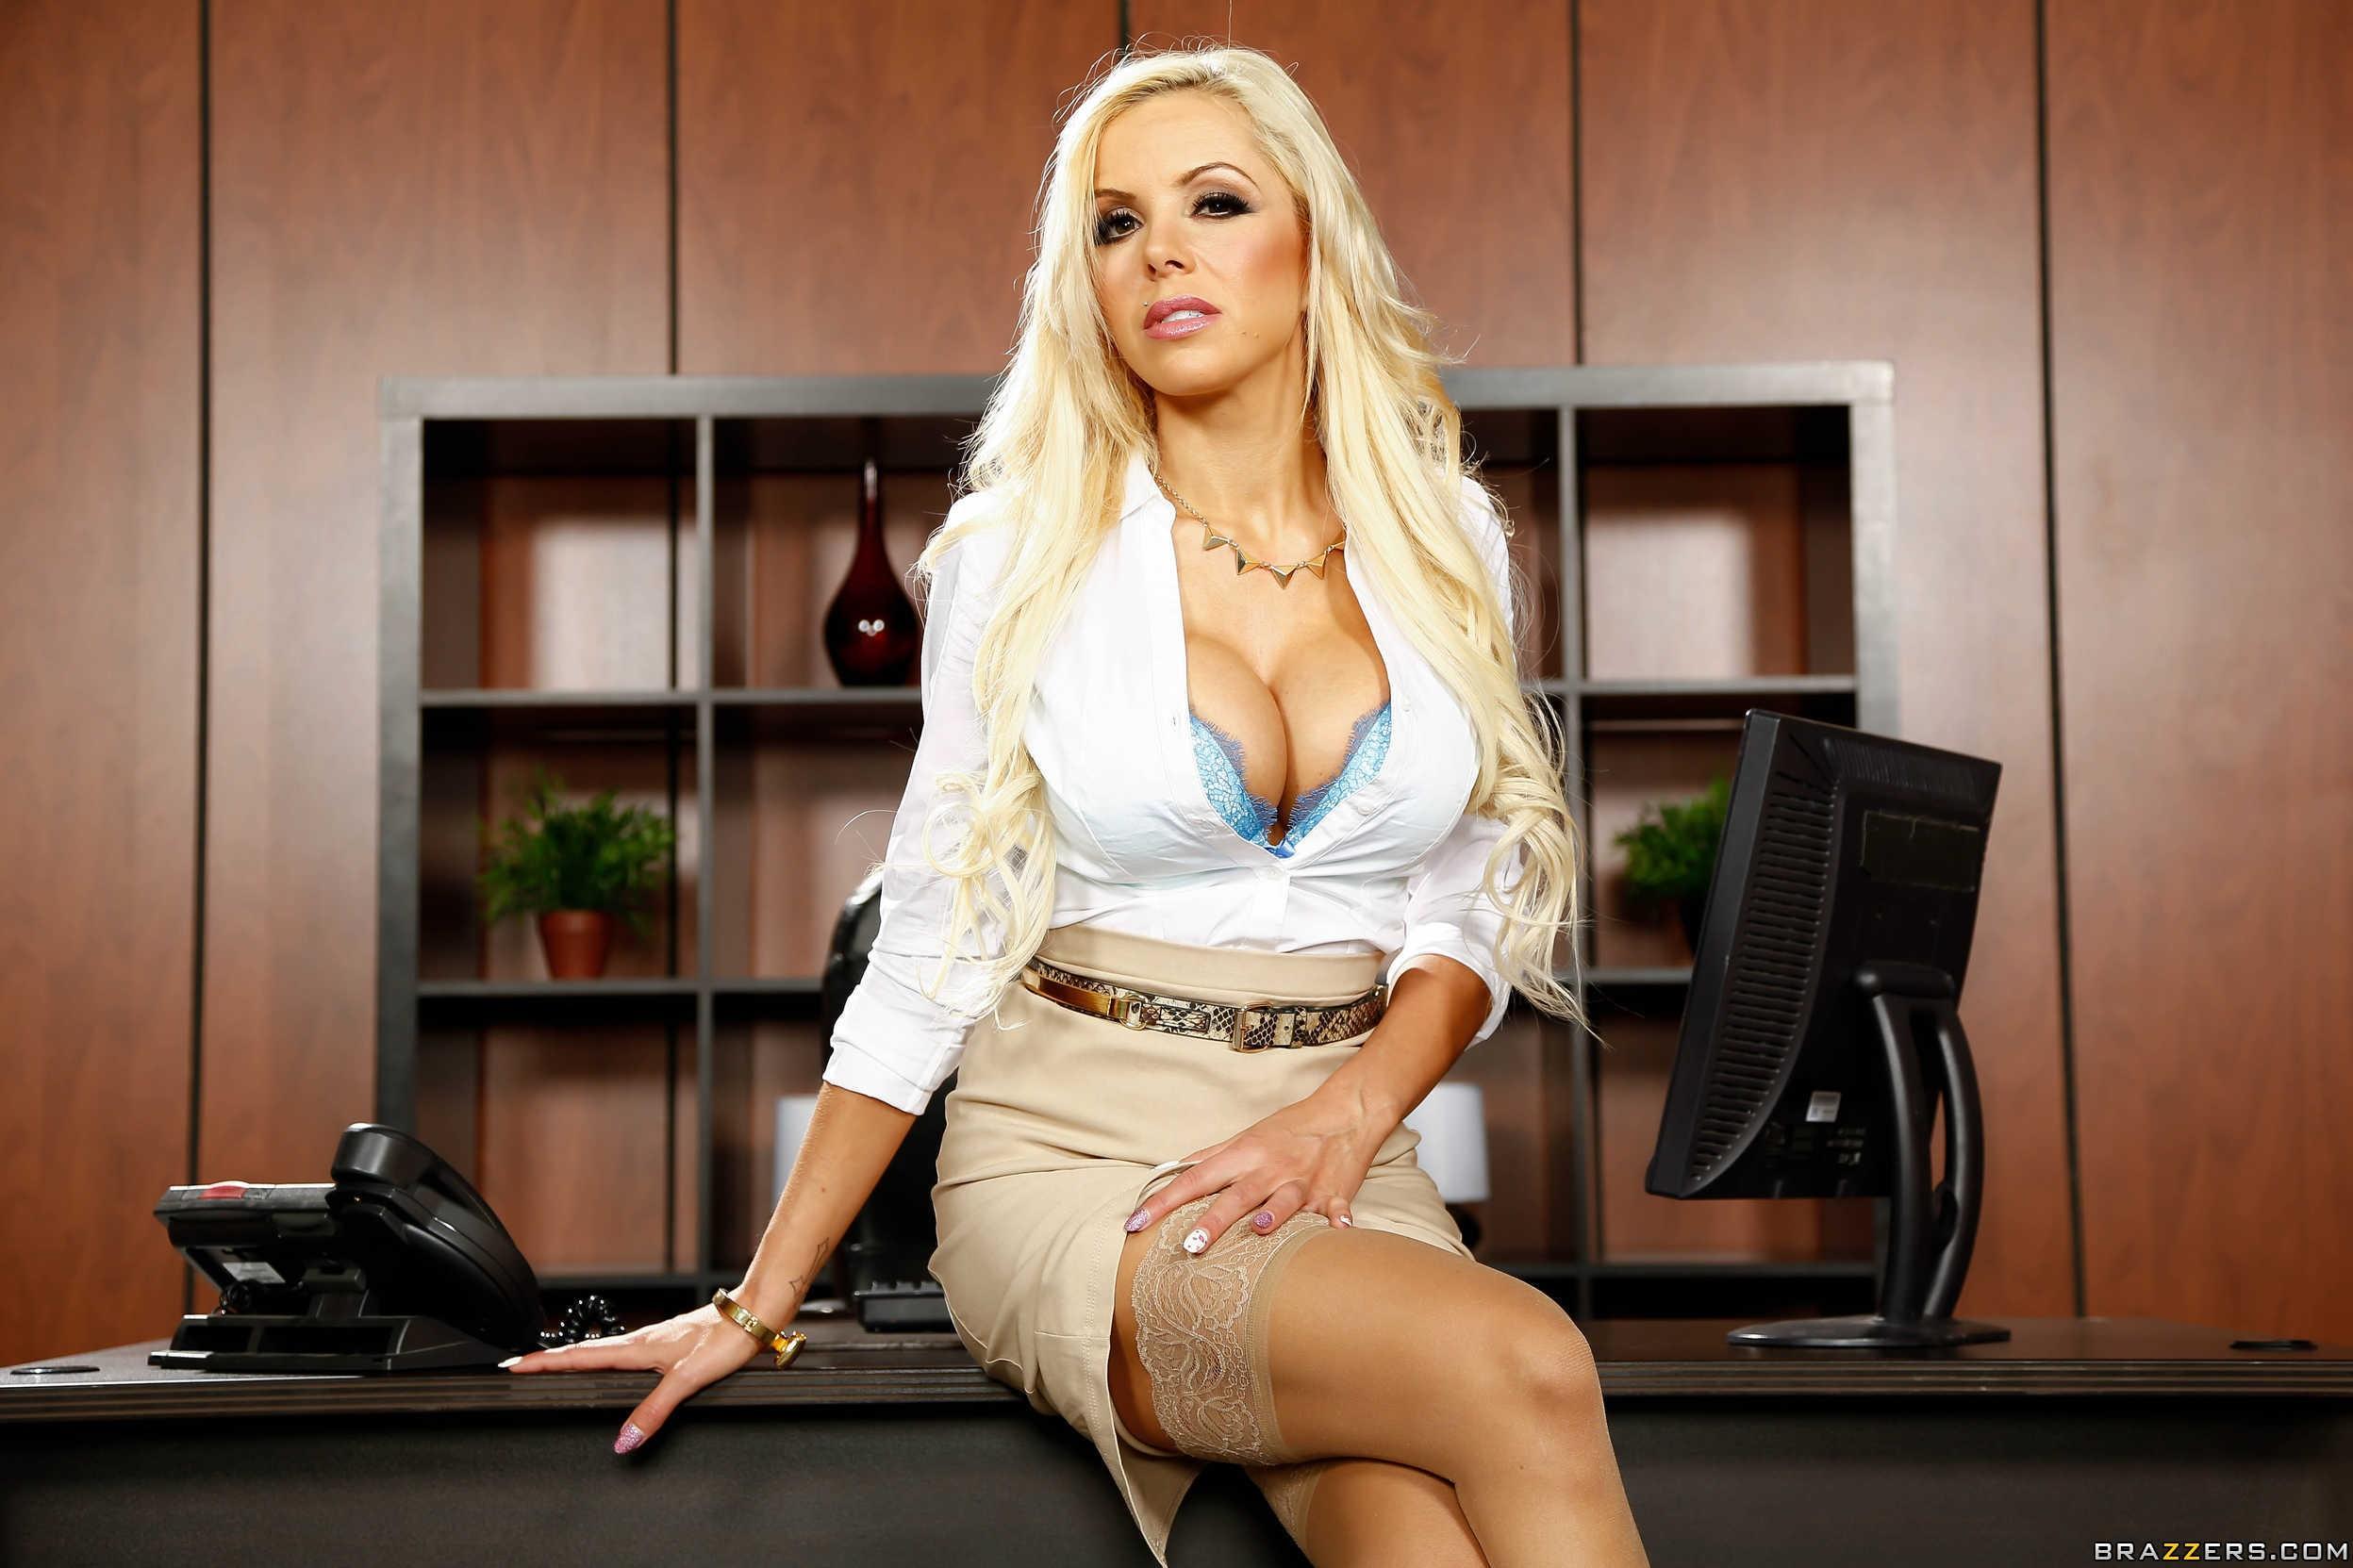 blonde, Nina Elle, pornstar, big boobs, cleavage, sitting